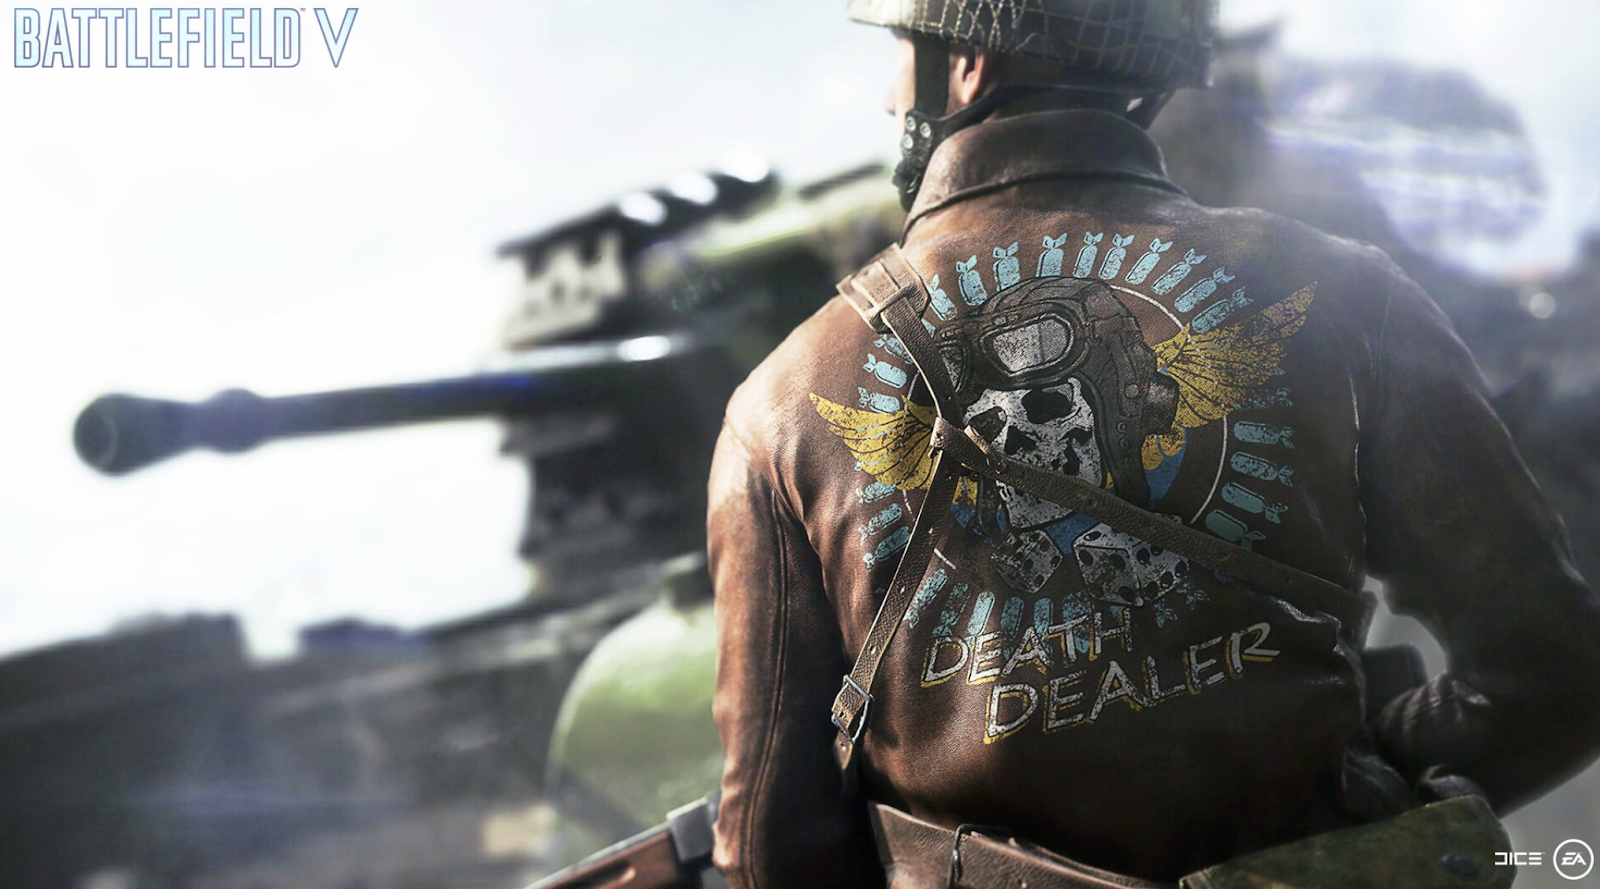 Anunciado Battlefield V, de vuelta a la Segunda Guerra Mundial